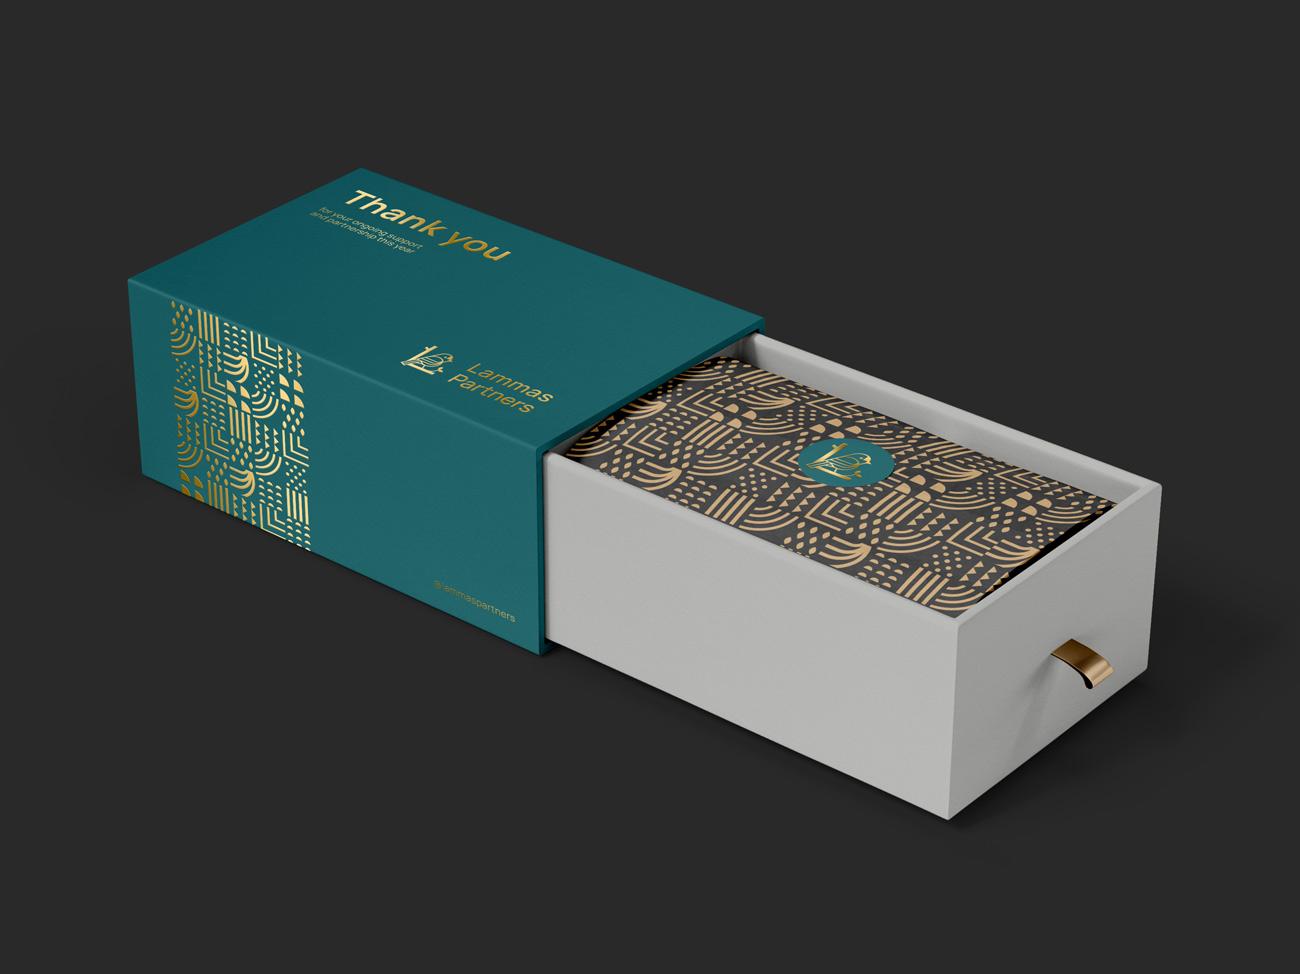 recruitment-merchandise-design-gift-box